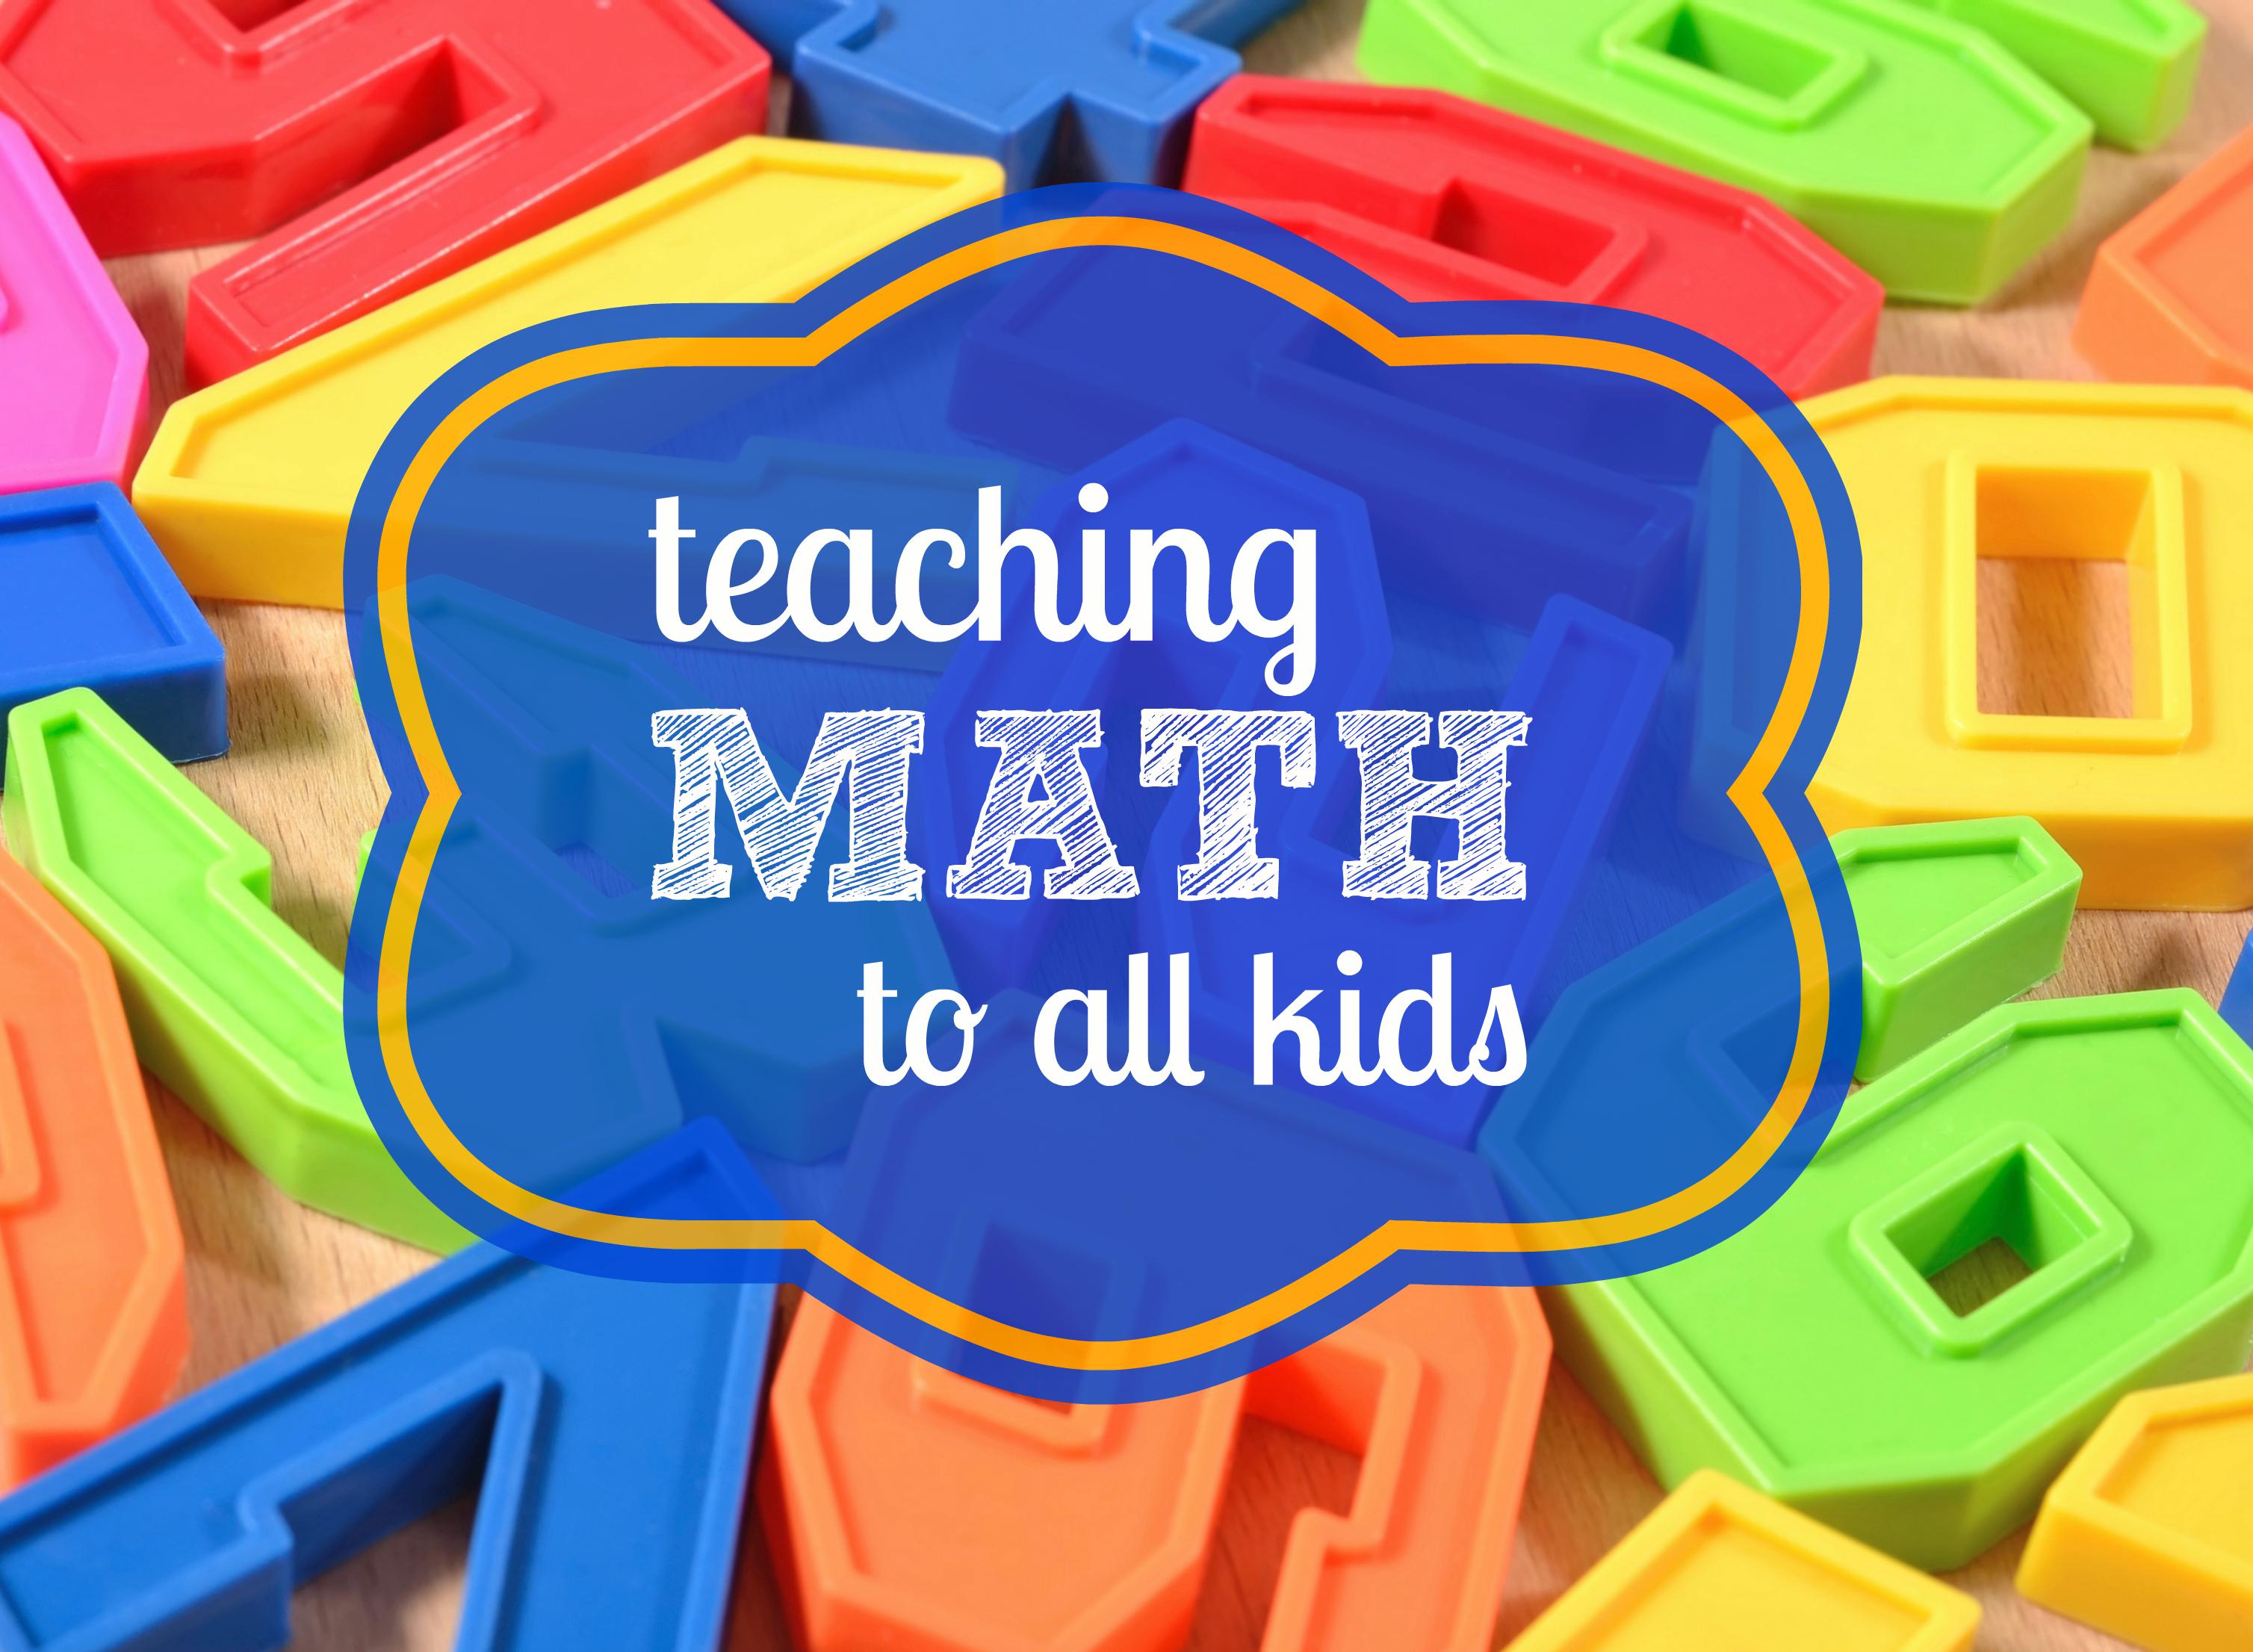 teaching math to all kids